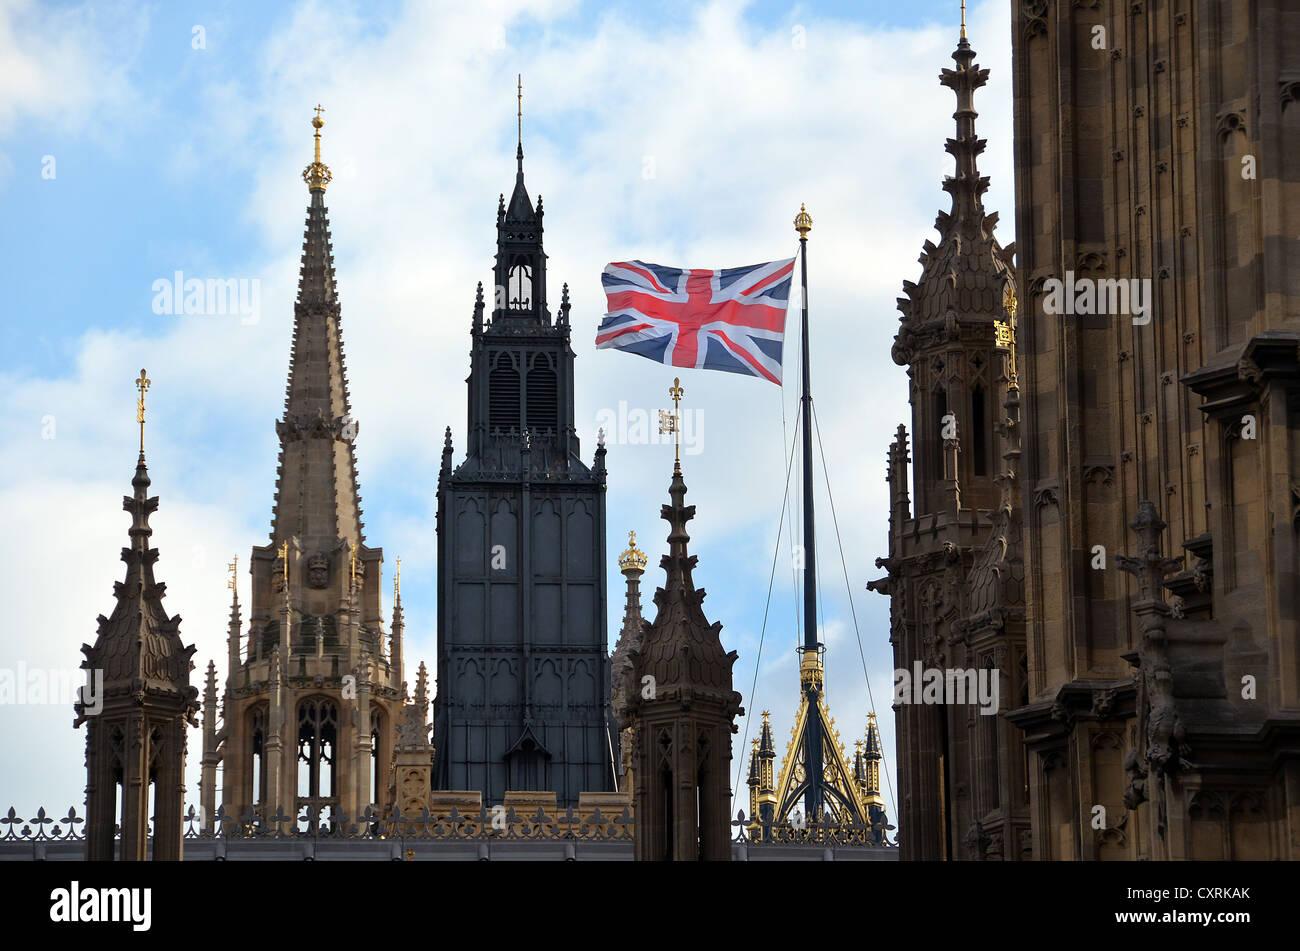 British Flag, Union Jack or Flag, flying above the Houses of Parliament, London, England, United Kingdom, Europe - Stock Image